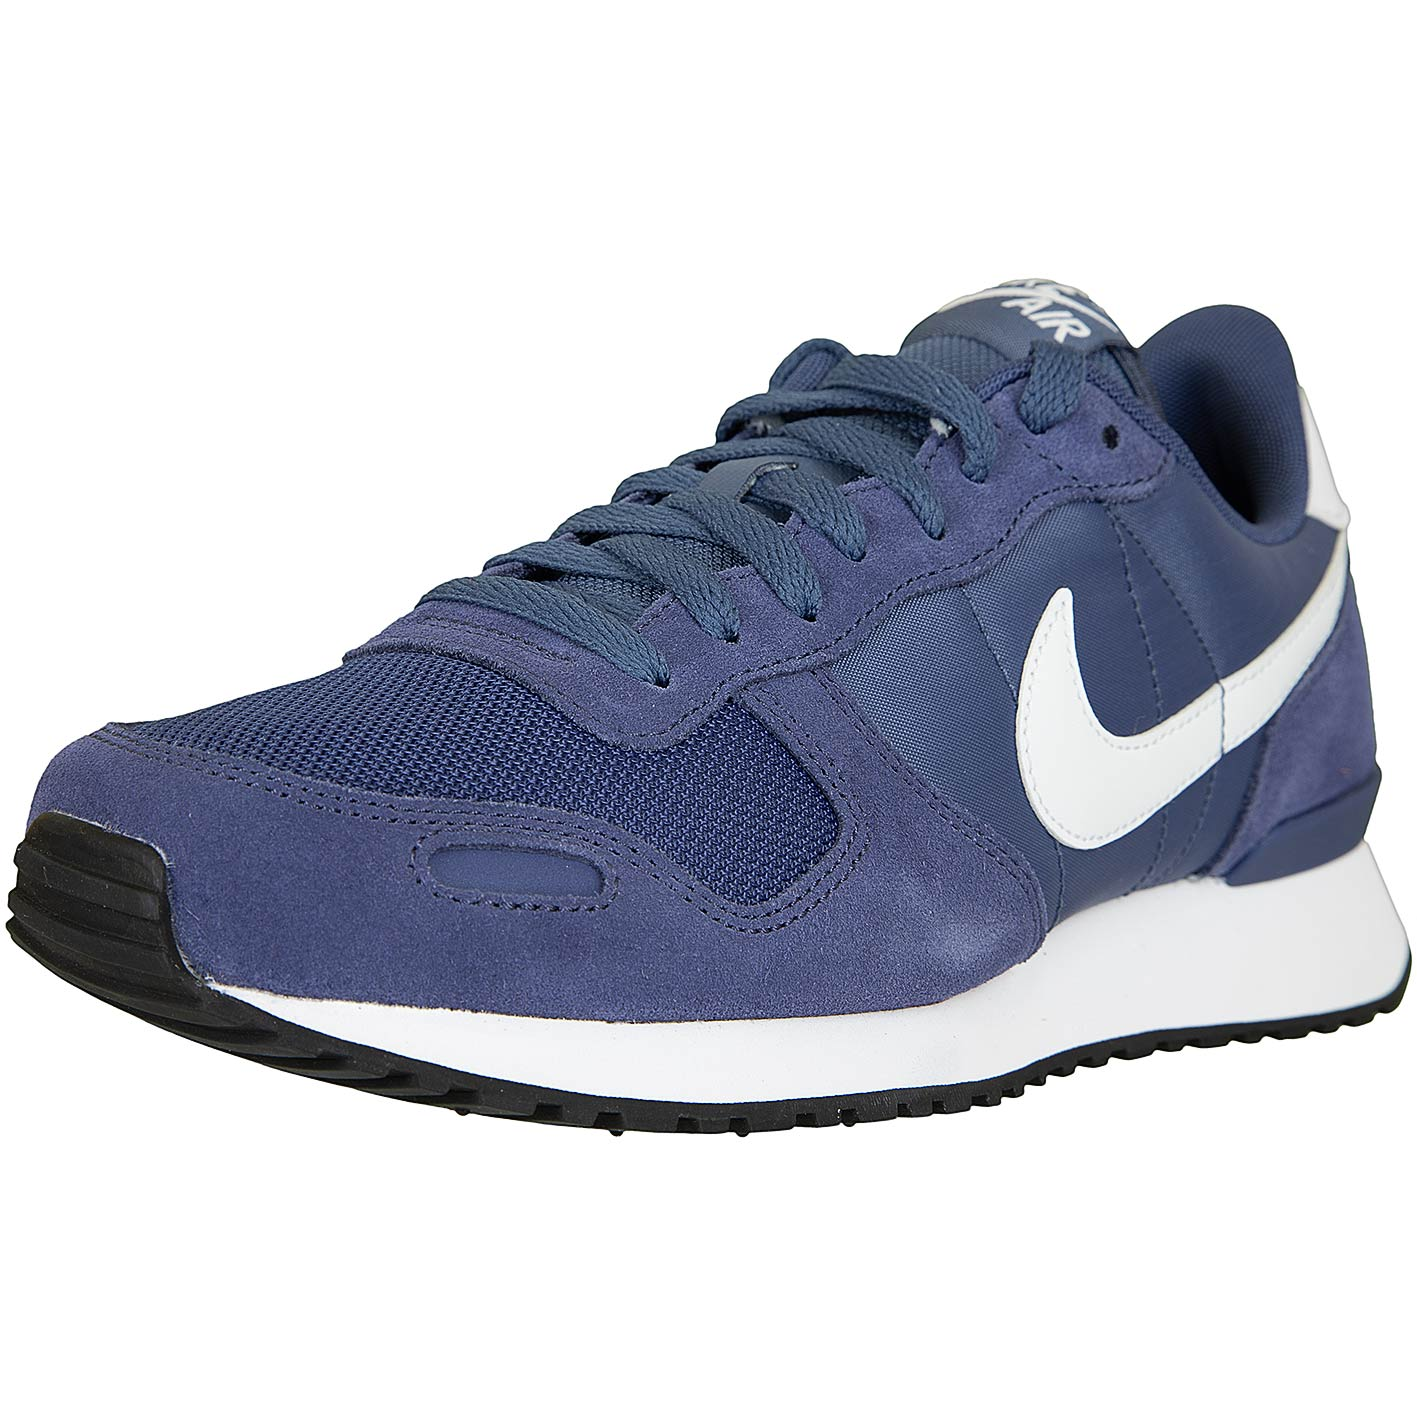 380cef9531aab5 ☆ Nike Sneaker Air Vortex blau weiß - hier bestellen!